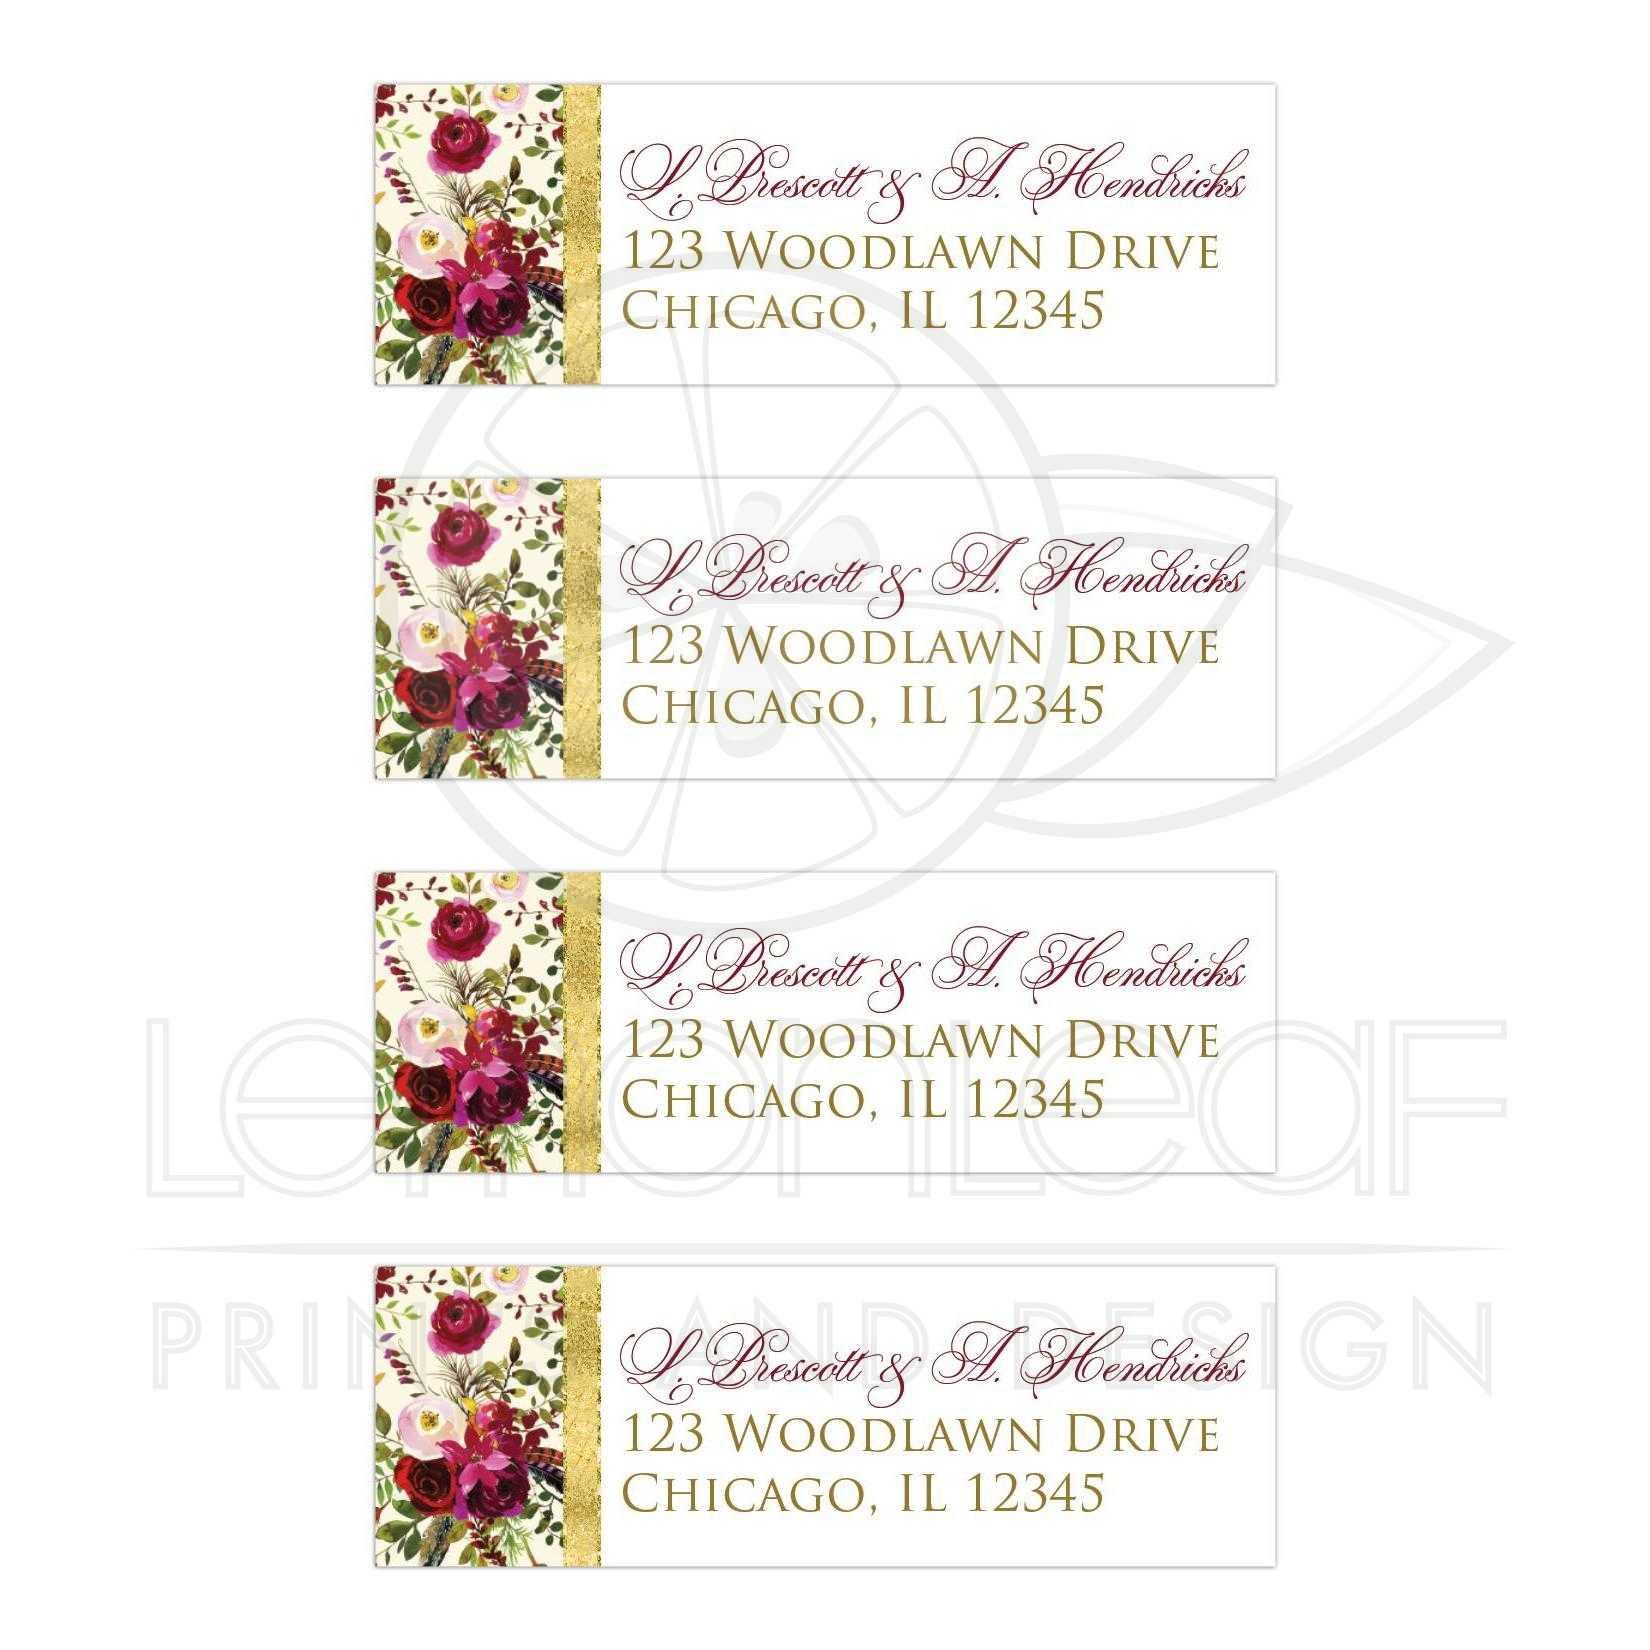 Label Design For Wedding Invitations Wedding Invitation: Beautiful Burgundy Watercolor Floral, Feathers Wedding